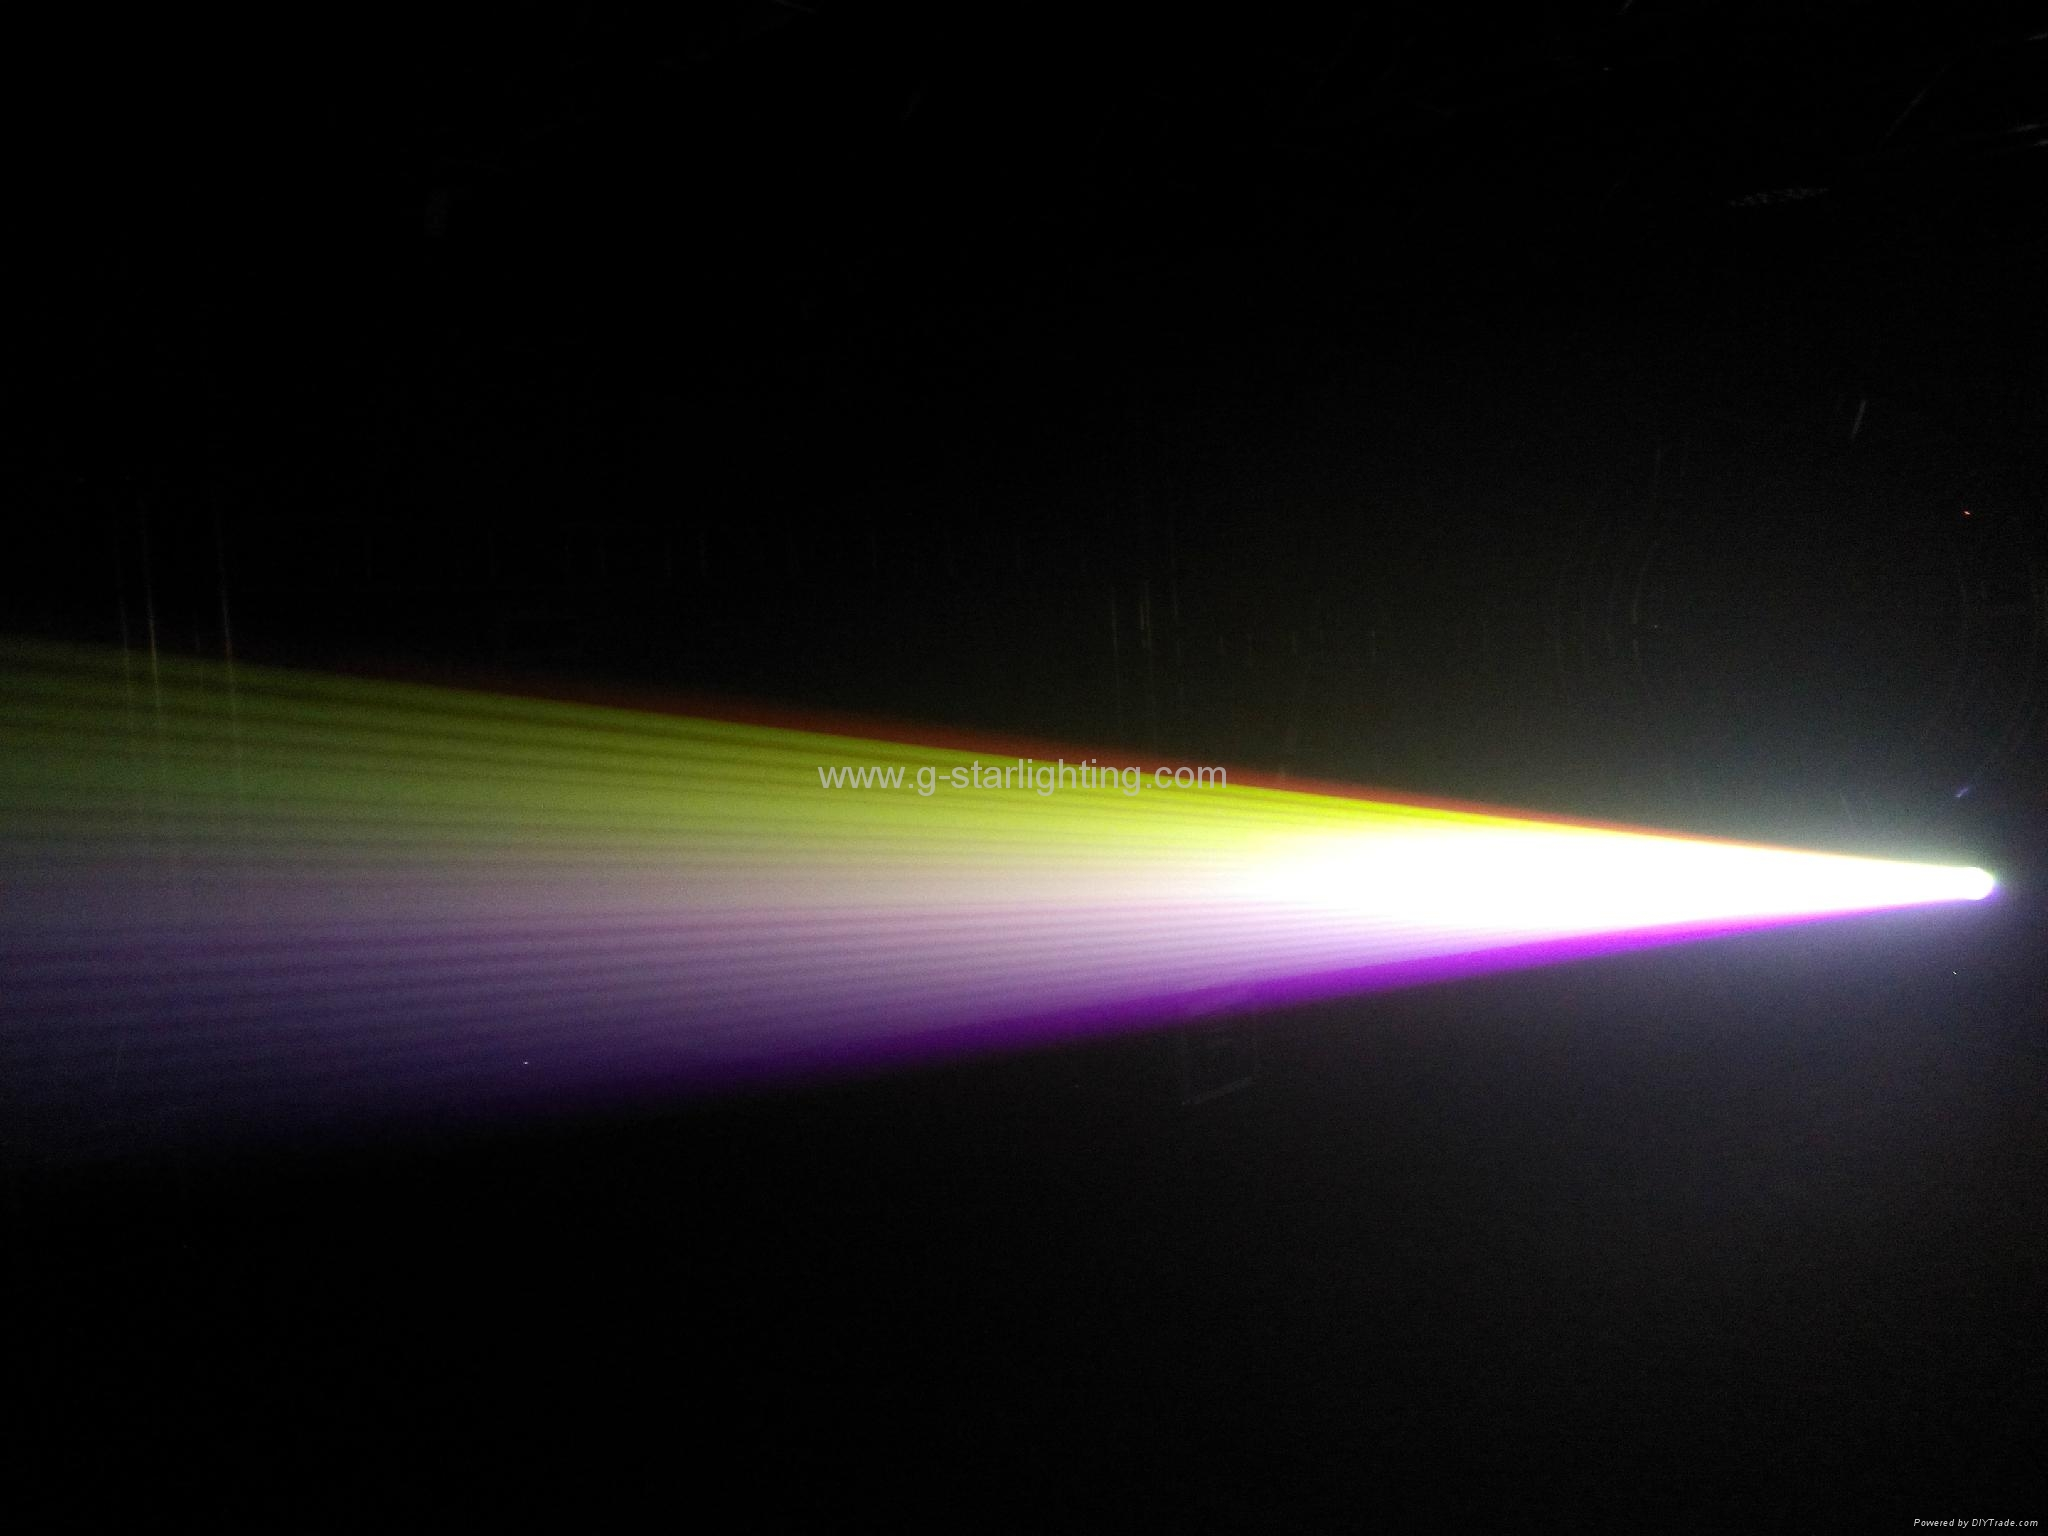 moving head light/stage lighting